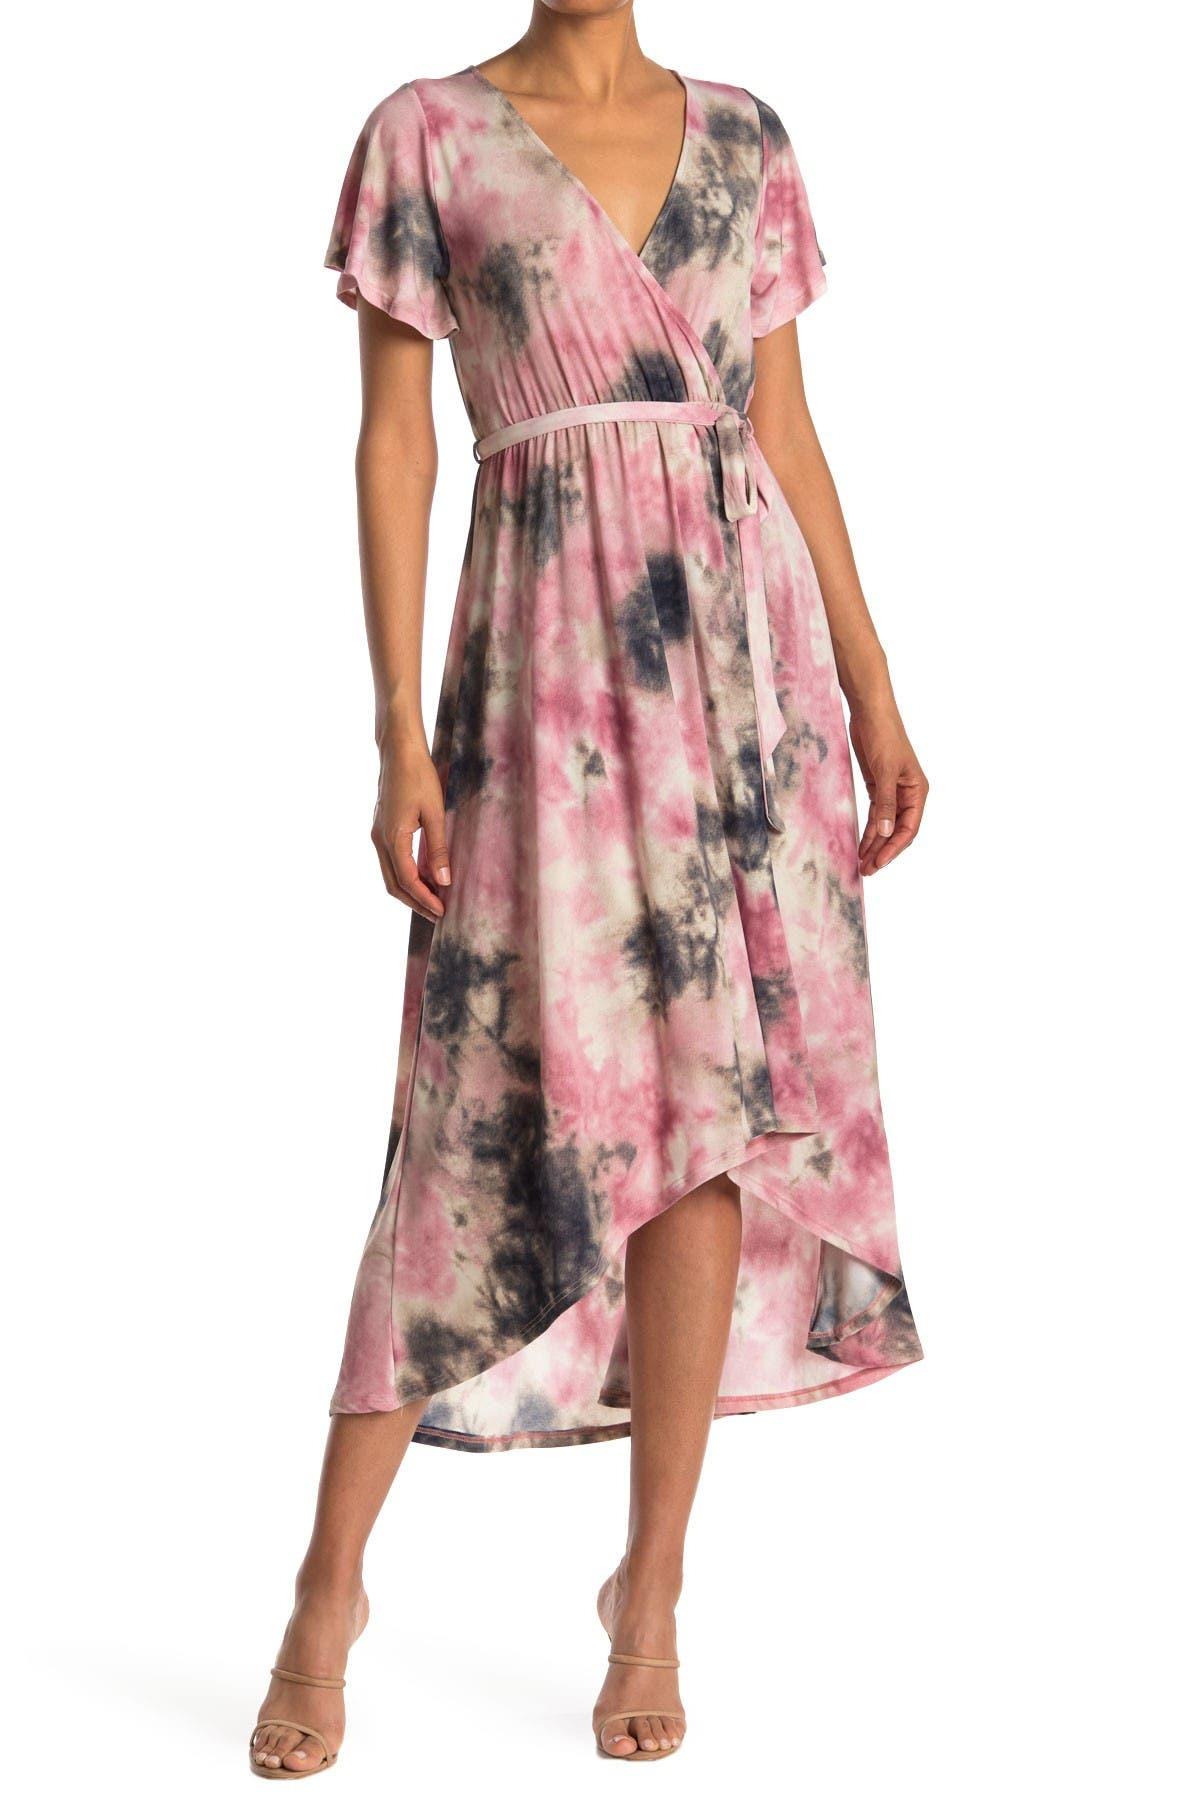 Image of WEST KEI Tie-Dye Surplice High/Low Midi Dress